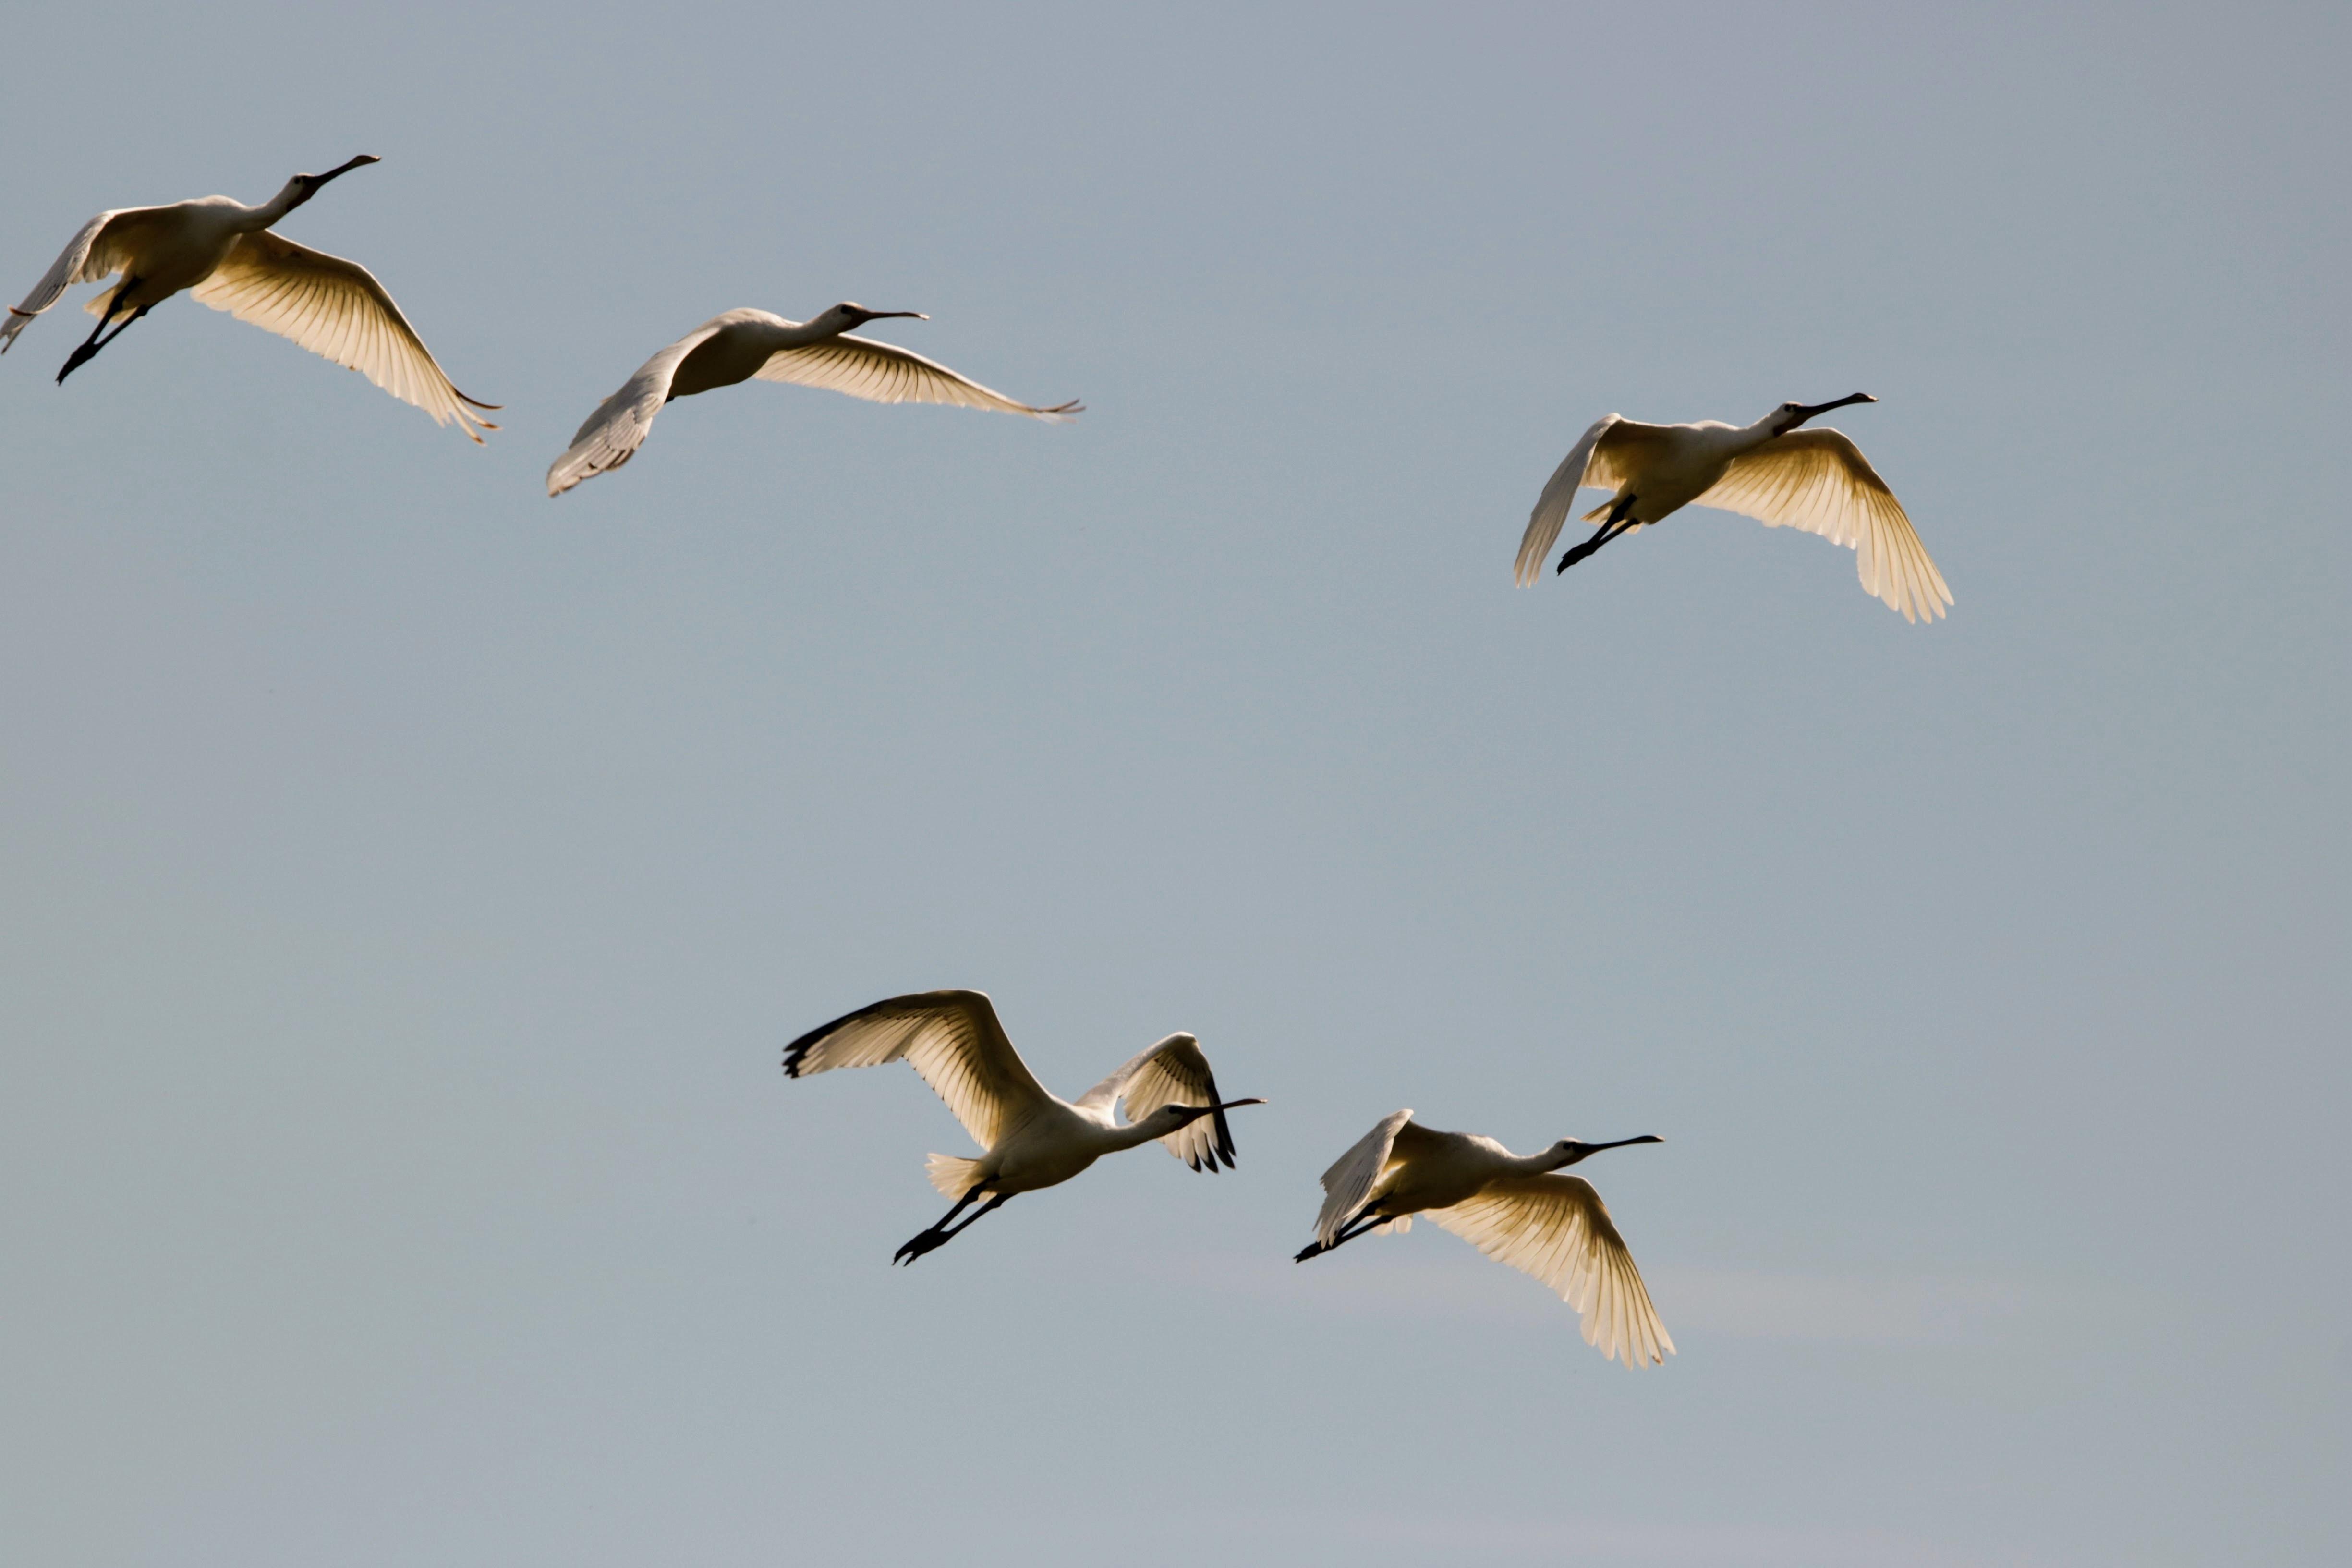 flock of birds in mid air